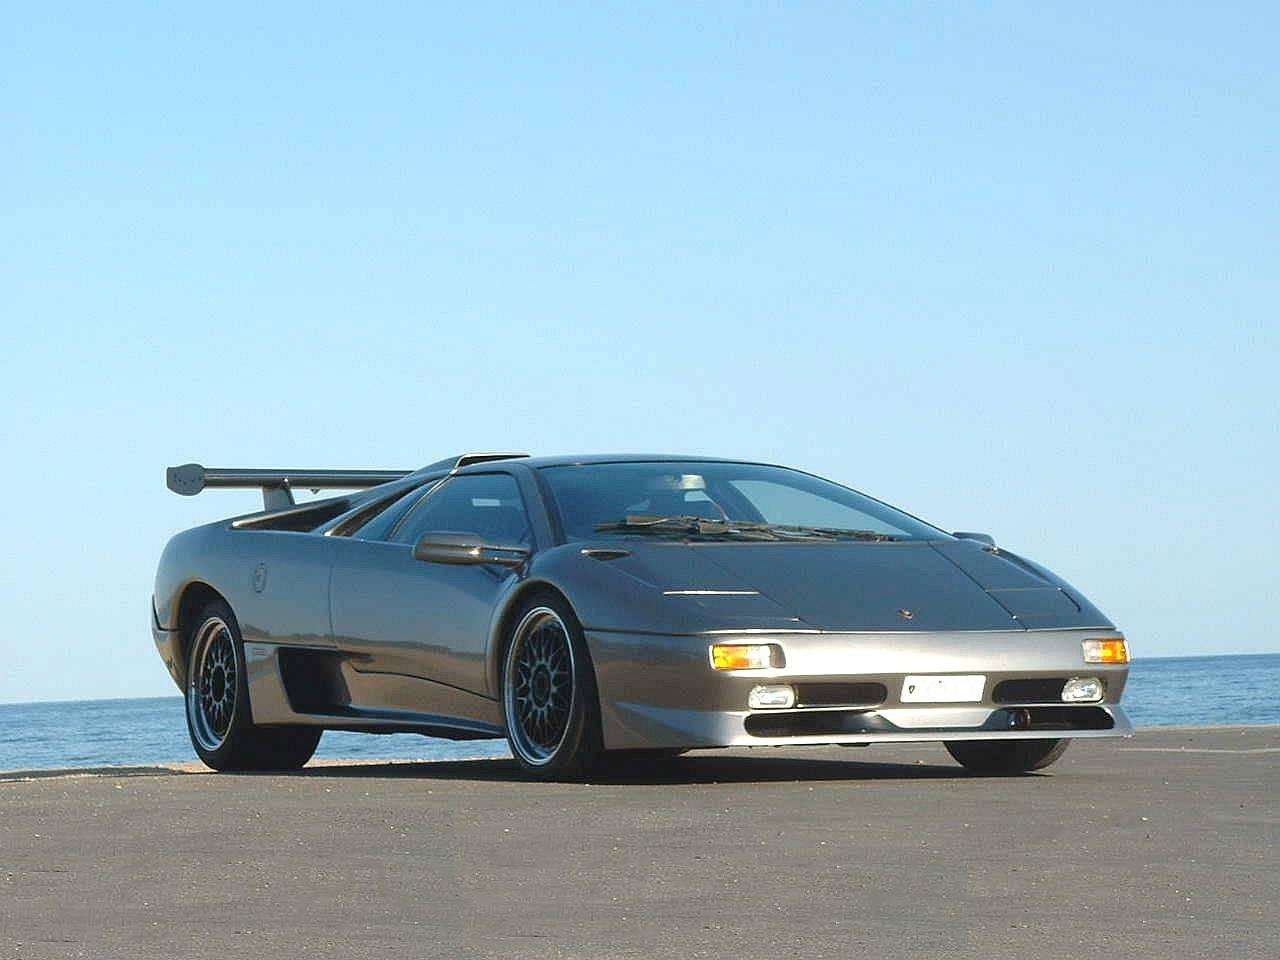 Lamborghini Diablo SVR chez